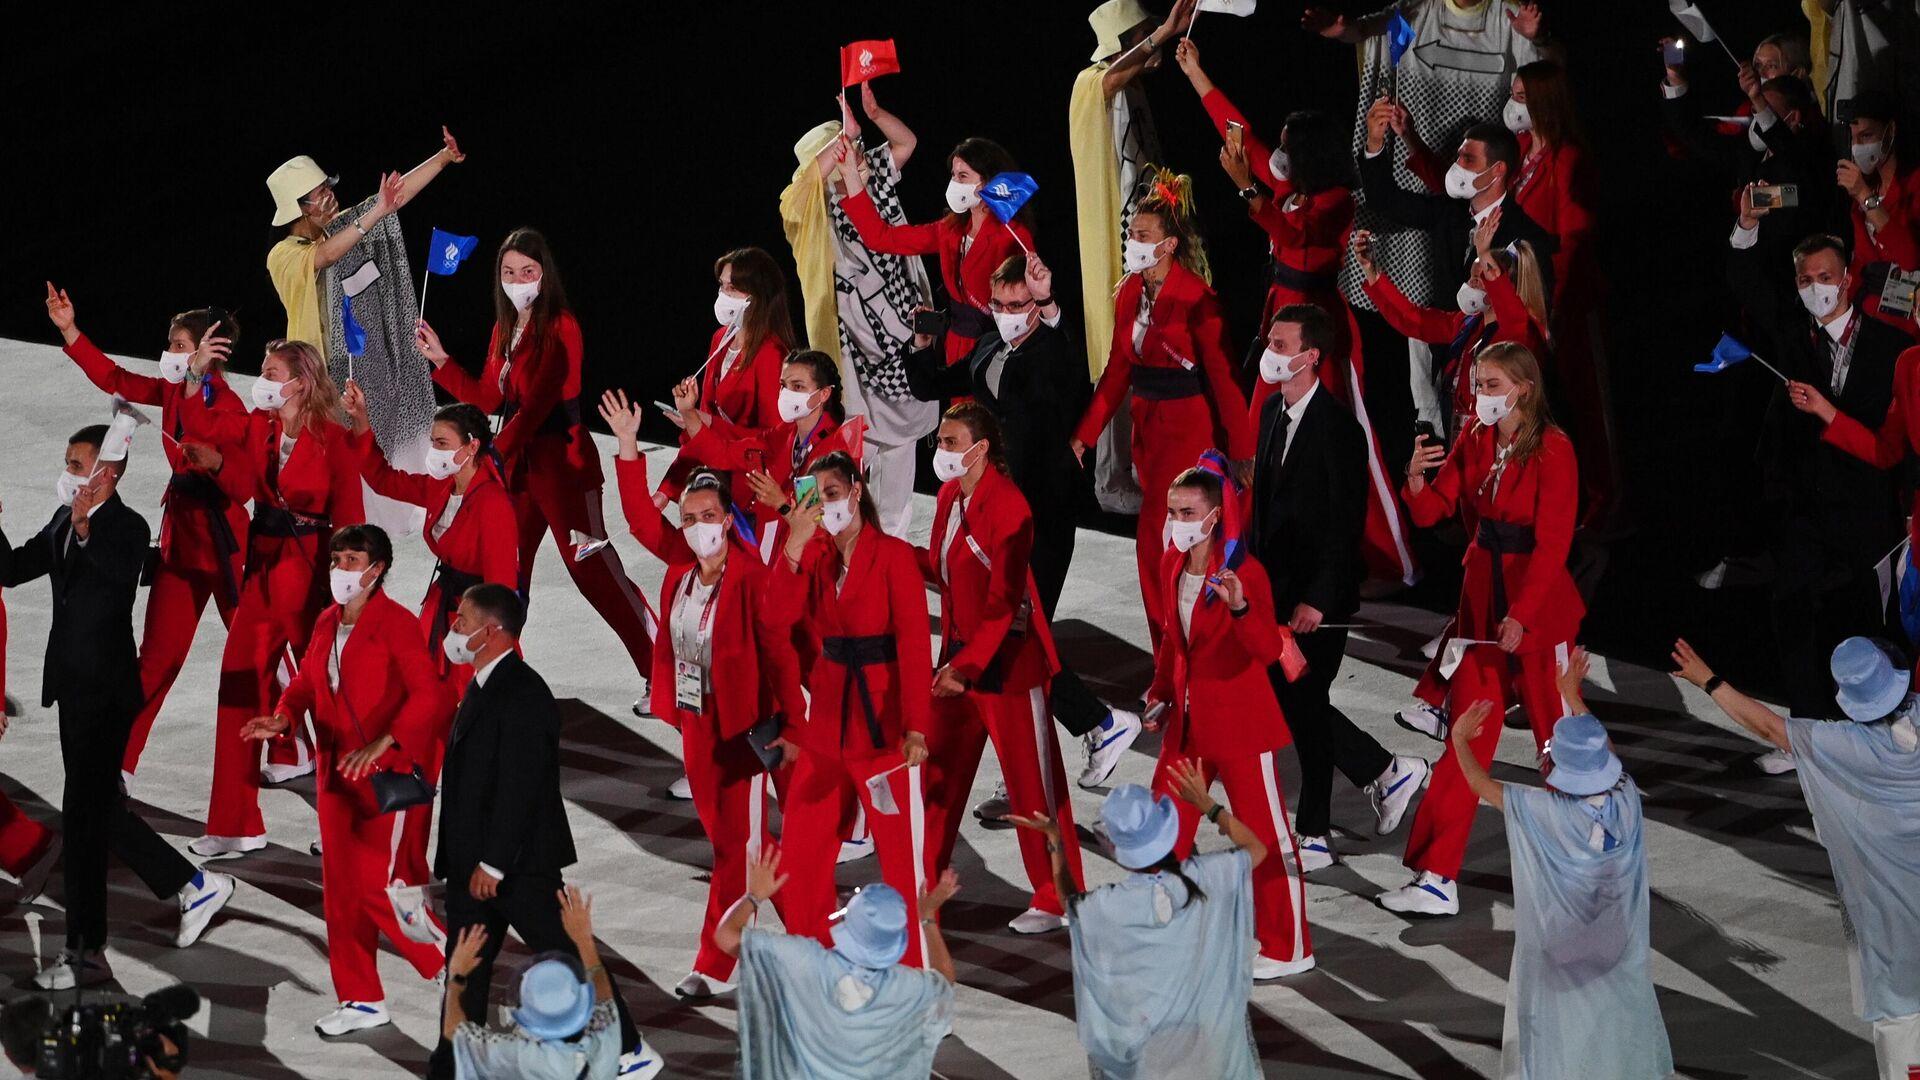 Церемония открытия XXXII летних Олимпийских игр - РИА Новости, 1920, 23.07.2021